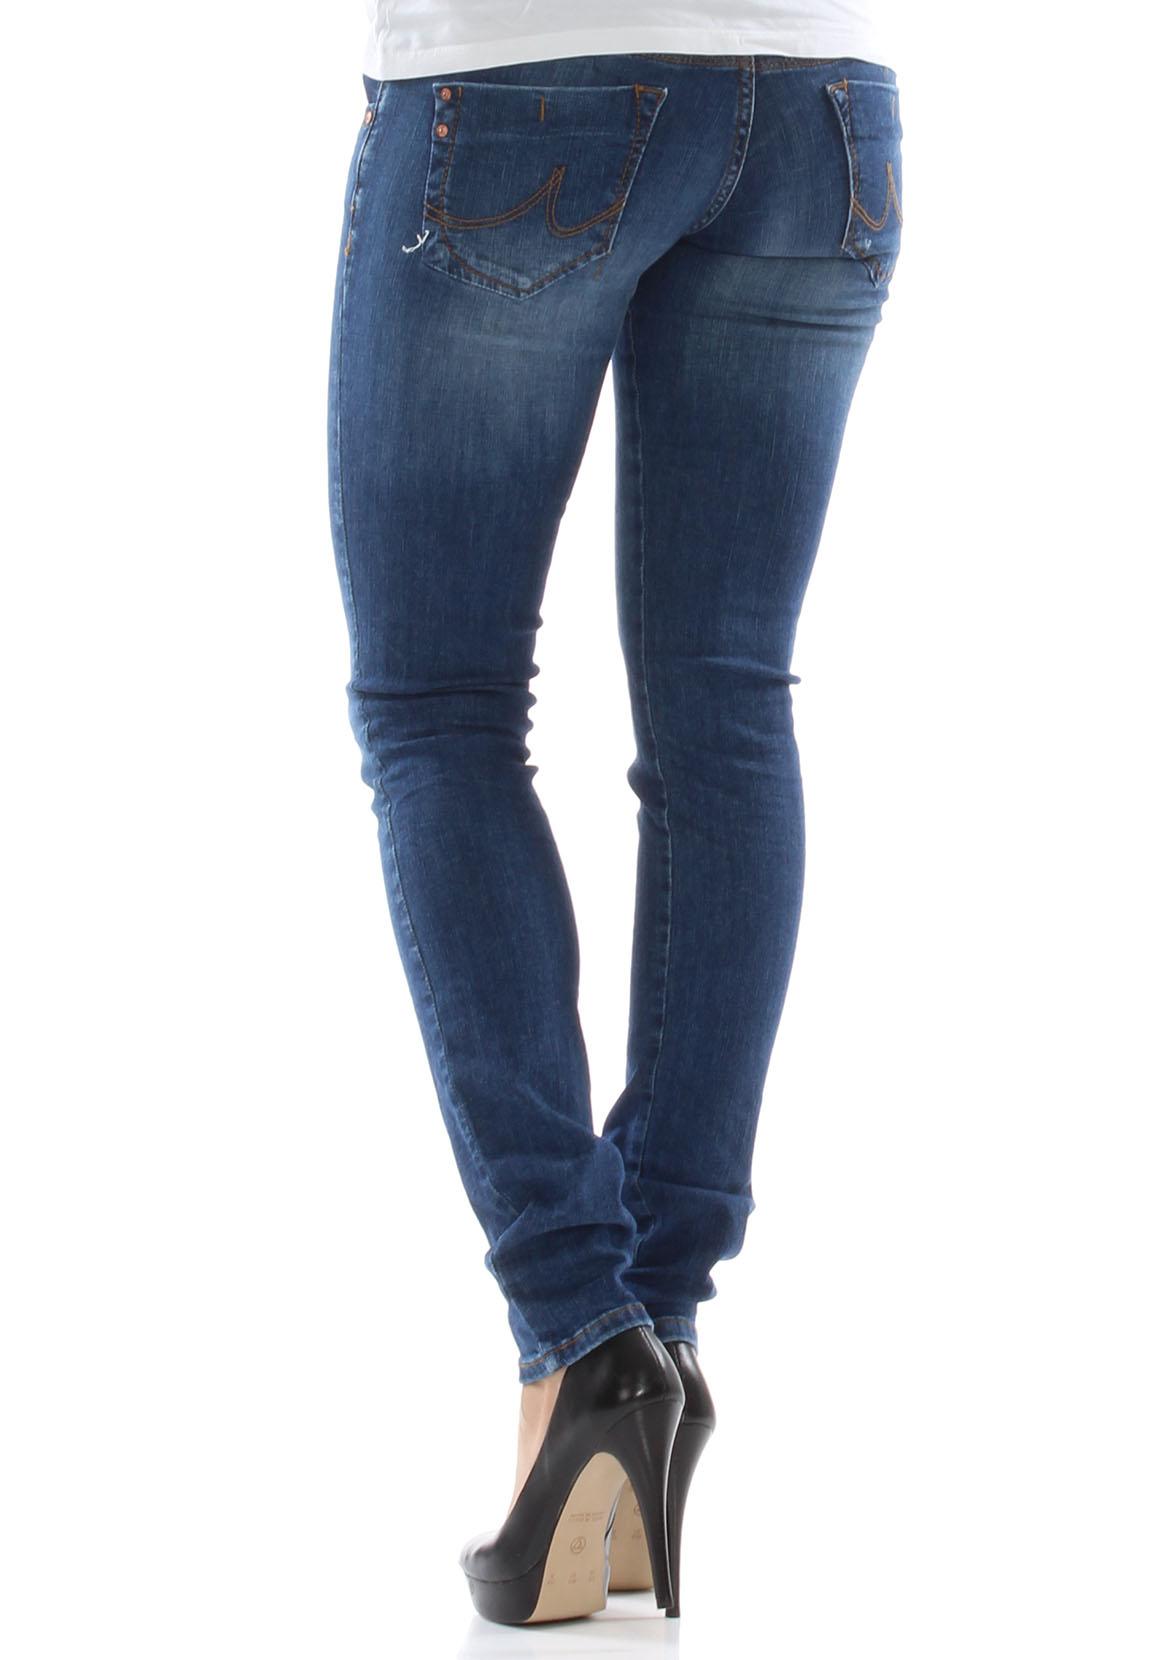 ltb jeans women molly ceciane wash damen jeans hosen. Black Bedroom Furniture Sets. Home Design Ideas